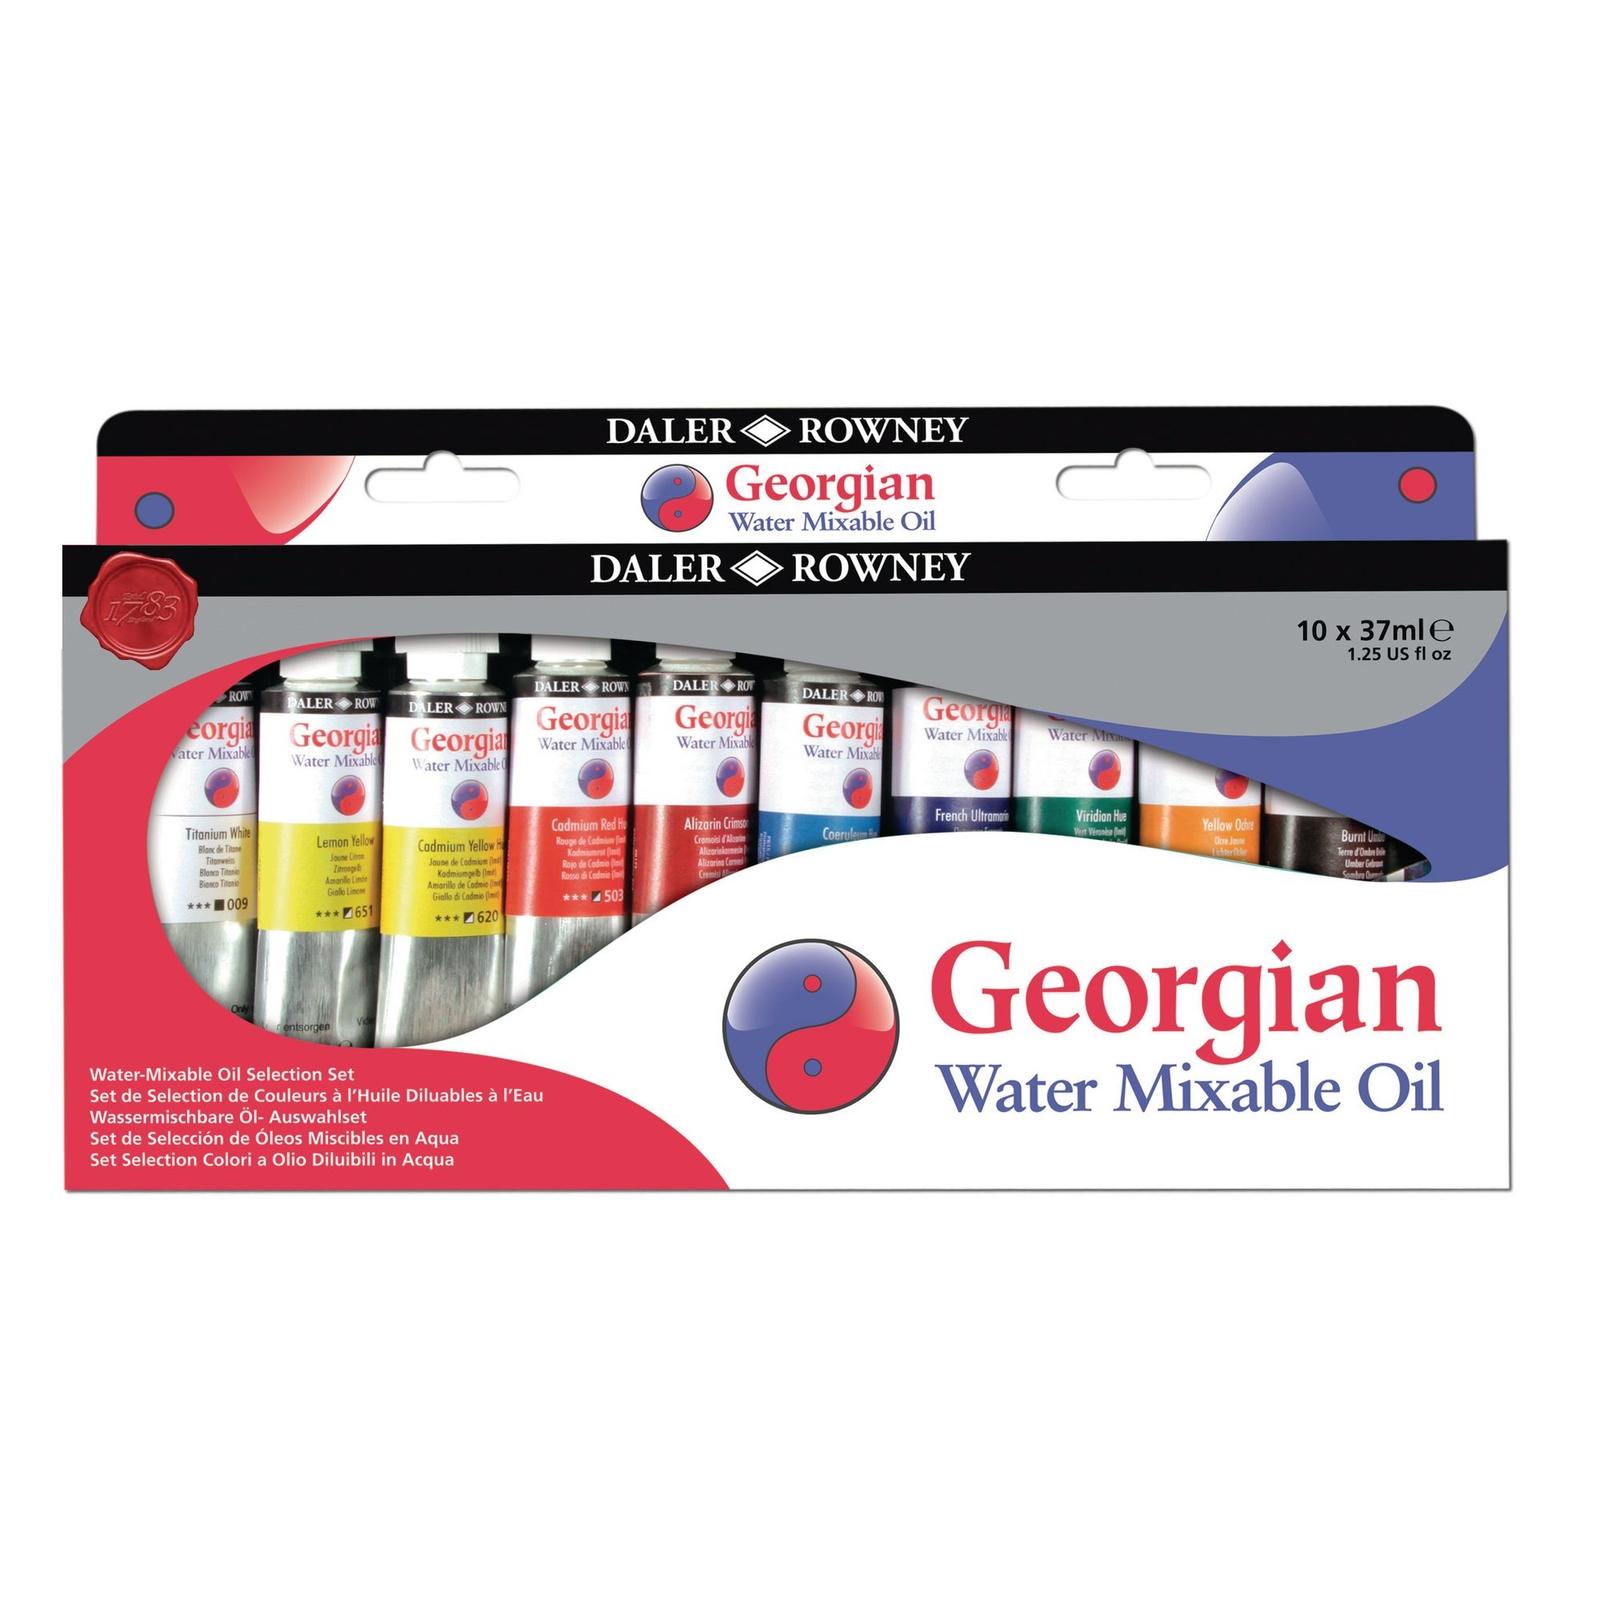 Georgian Water Mixable Oils